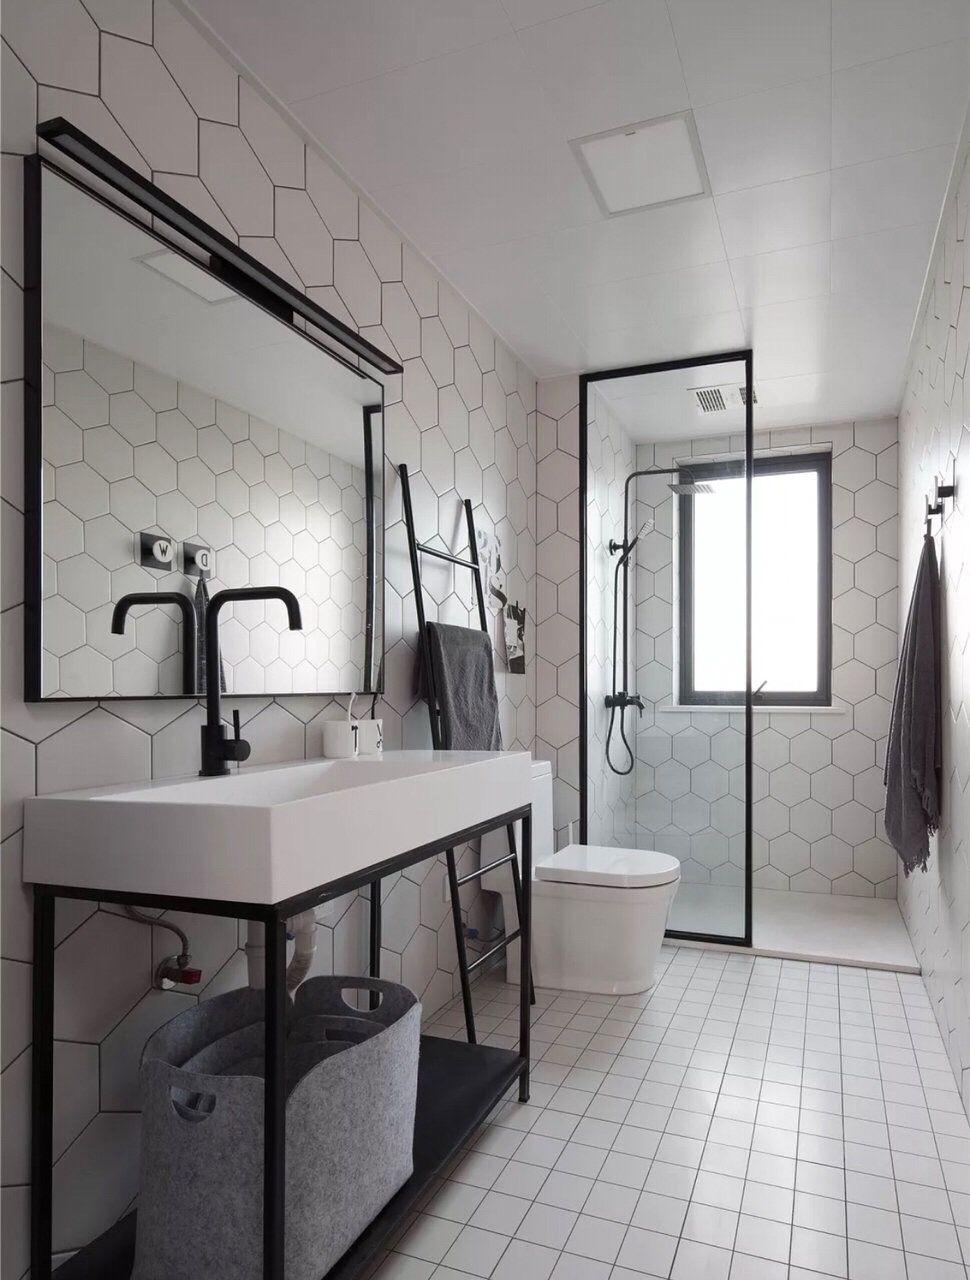 15 Long Narrow Bathroom Layout Ideas Designs Functional Stylish Industrial Bathroom Design Stylish Bathroom Narrow Bathroom